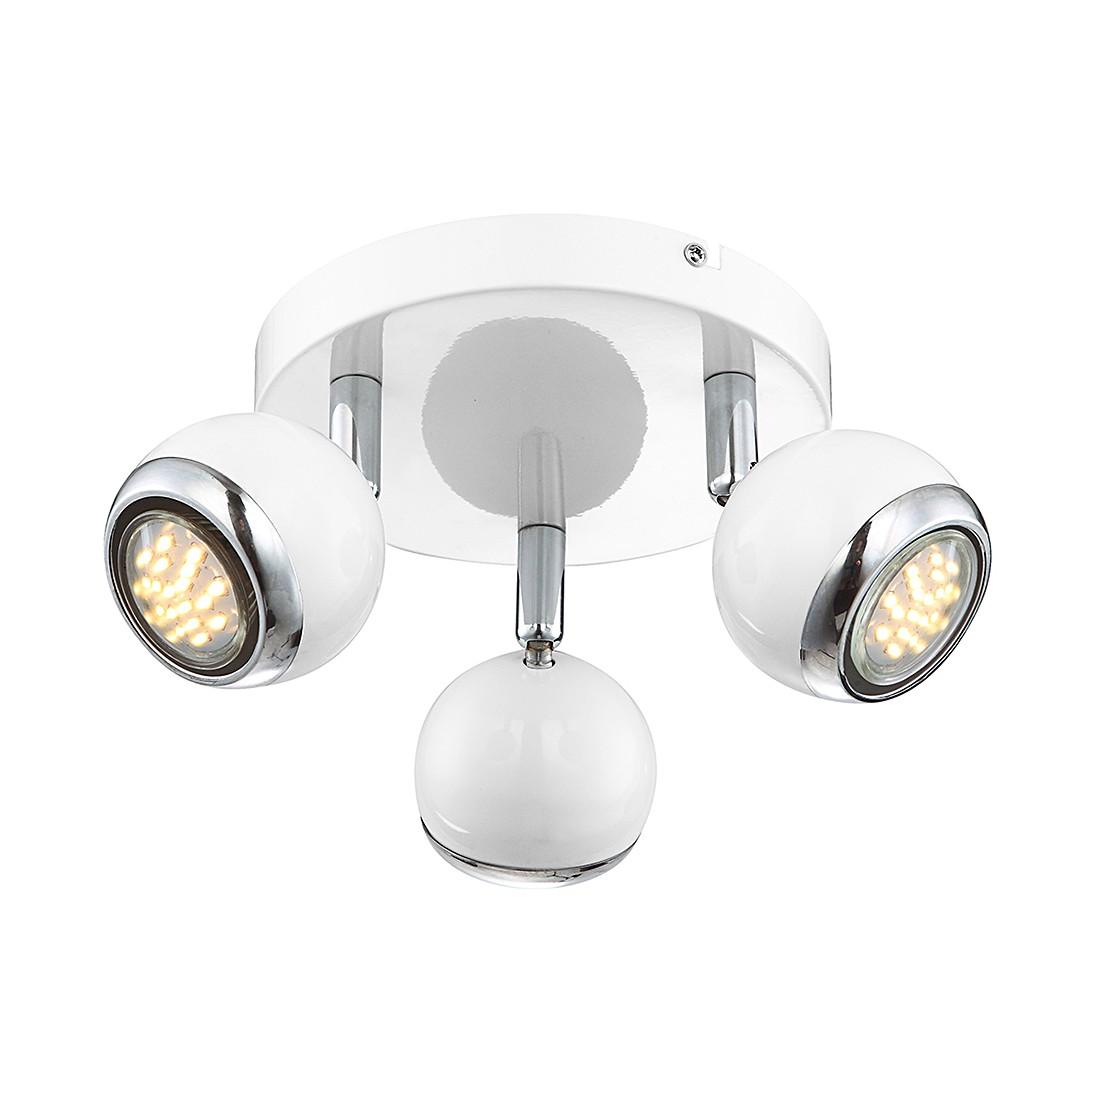 EEK A+, Deckenleuchte OMAN – Metall – Silber – 3-flammig, Globo Lighting günstig